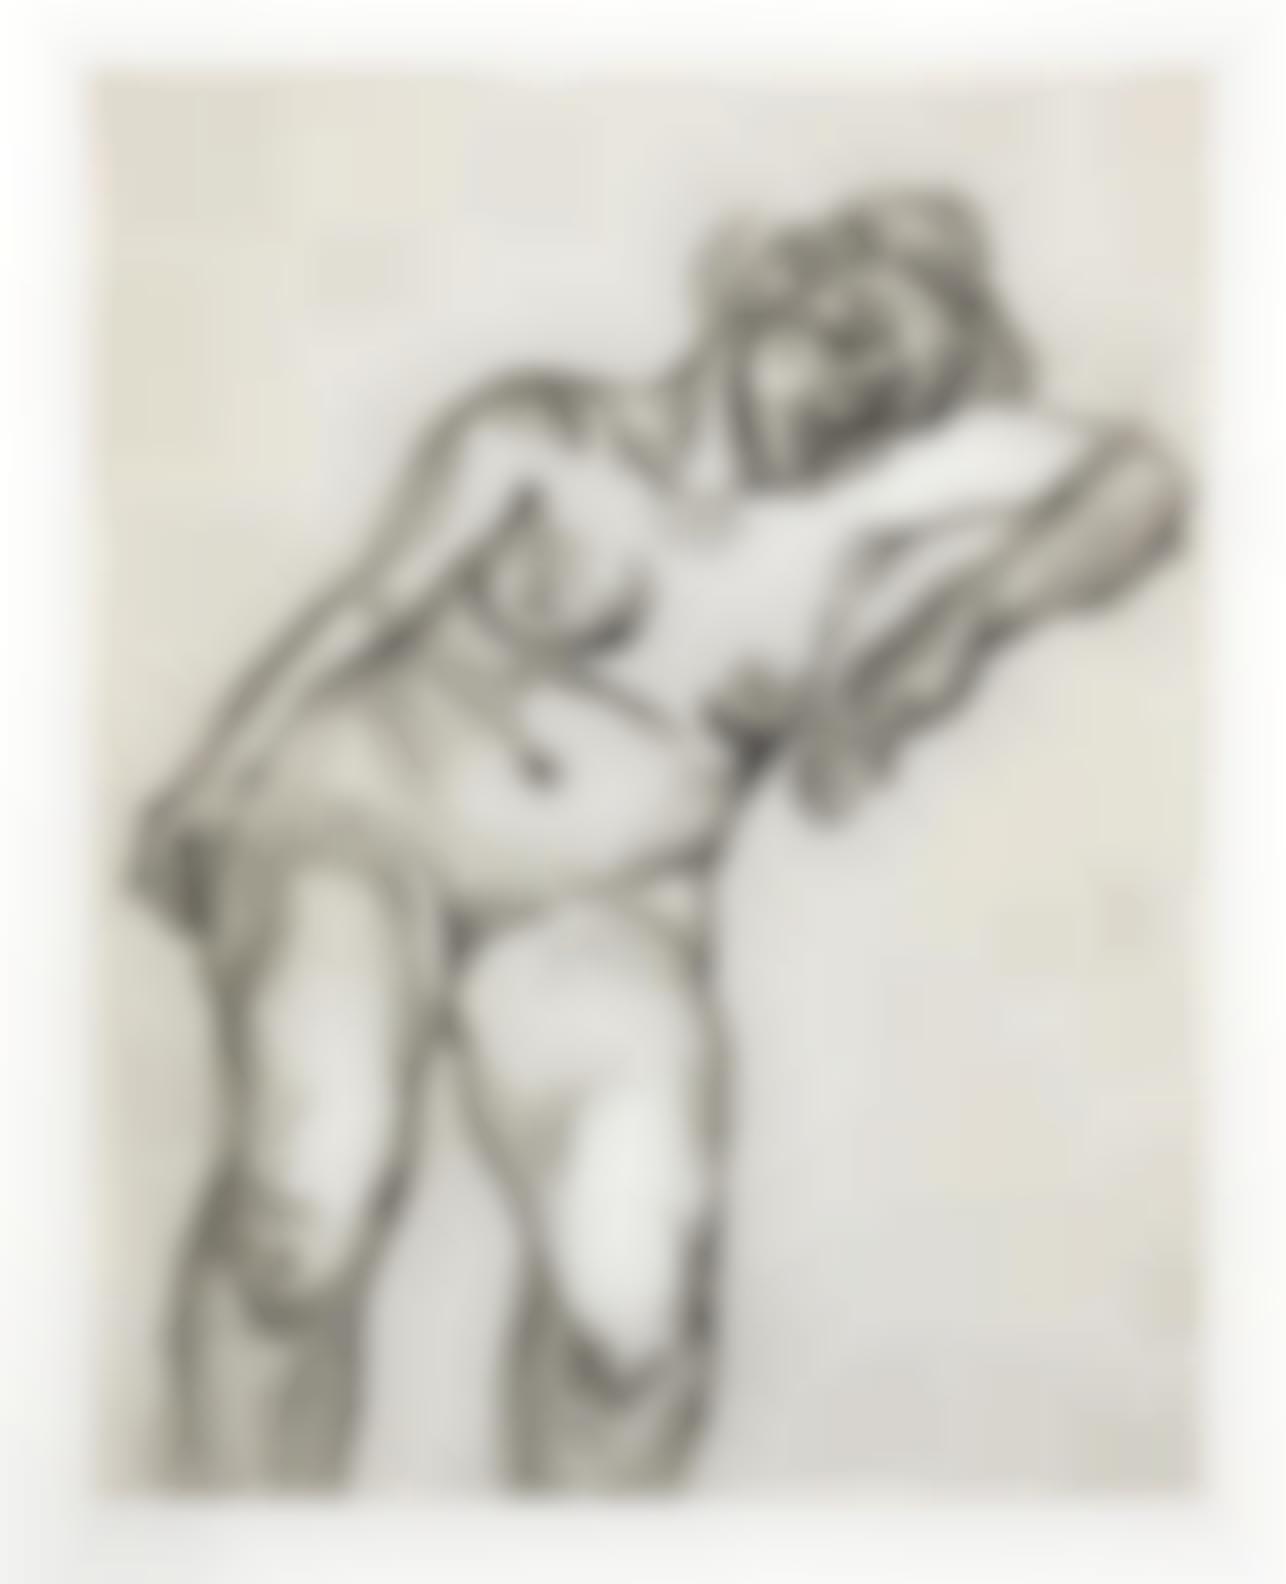 Lucian Freud-Blond Girl (Hartley24; Figura 33)-1985